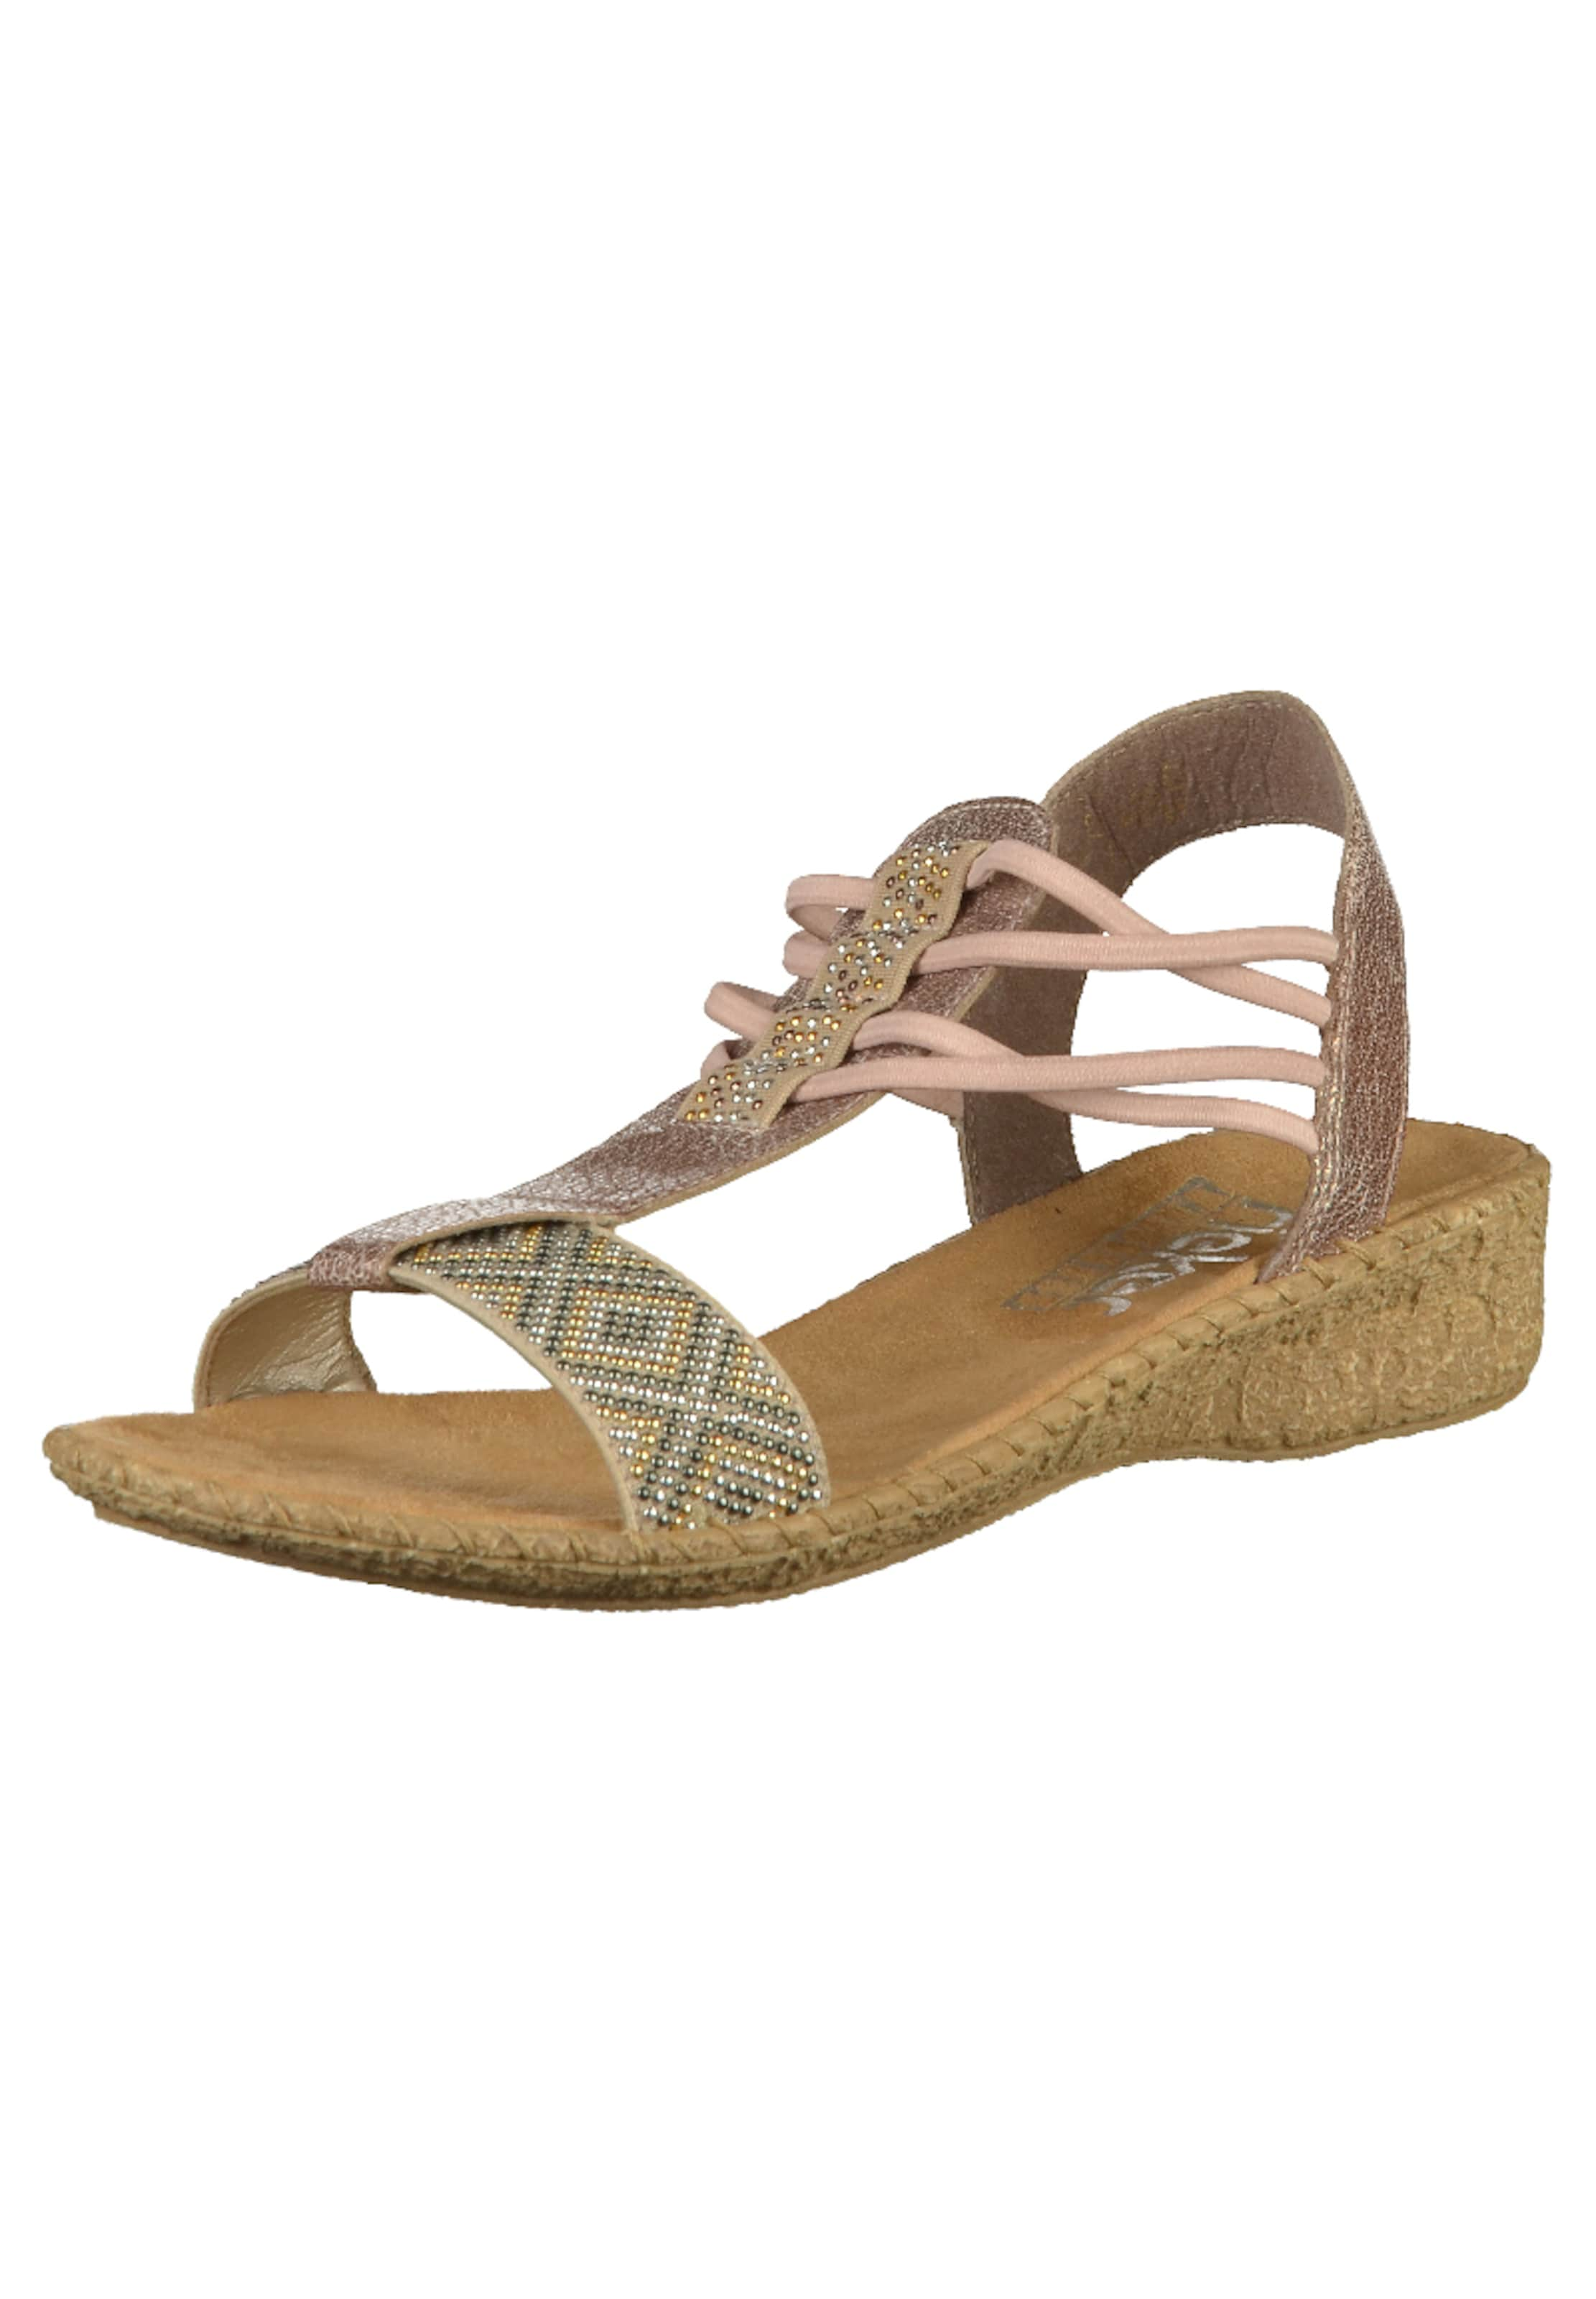 Sandales Rieker Avec Ceinture « Sandale » Beige vsXi4jnxw